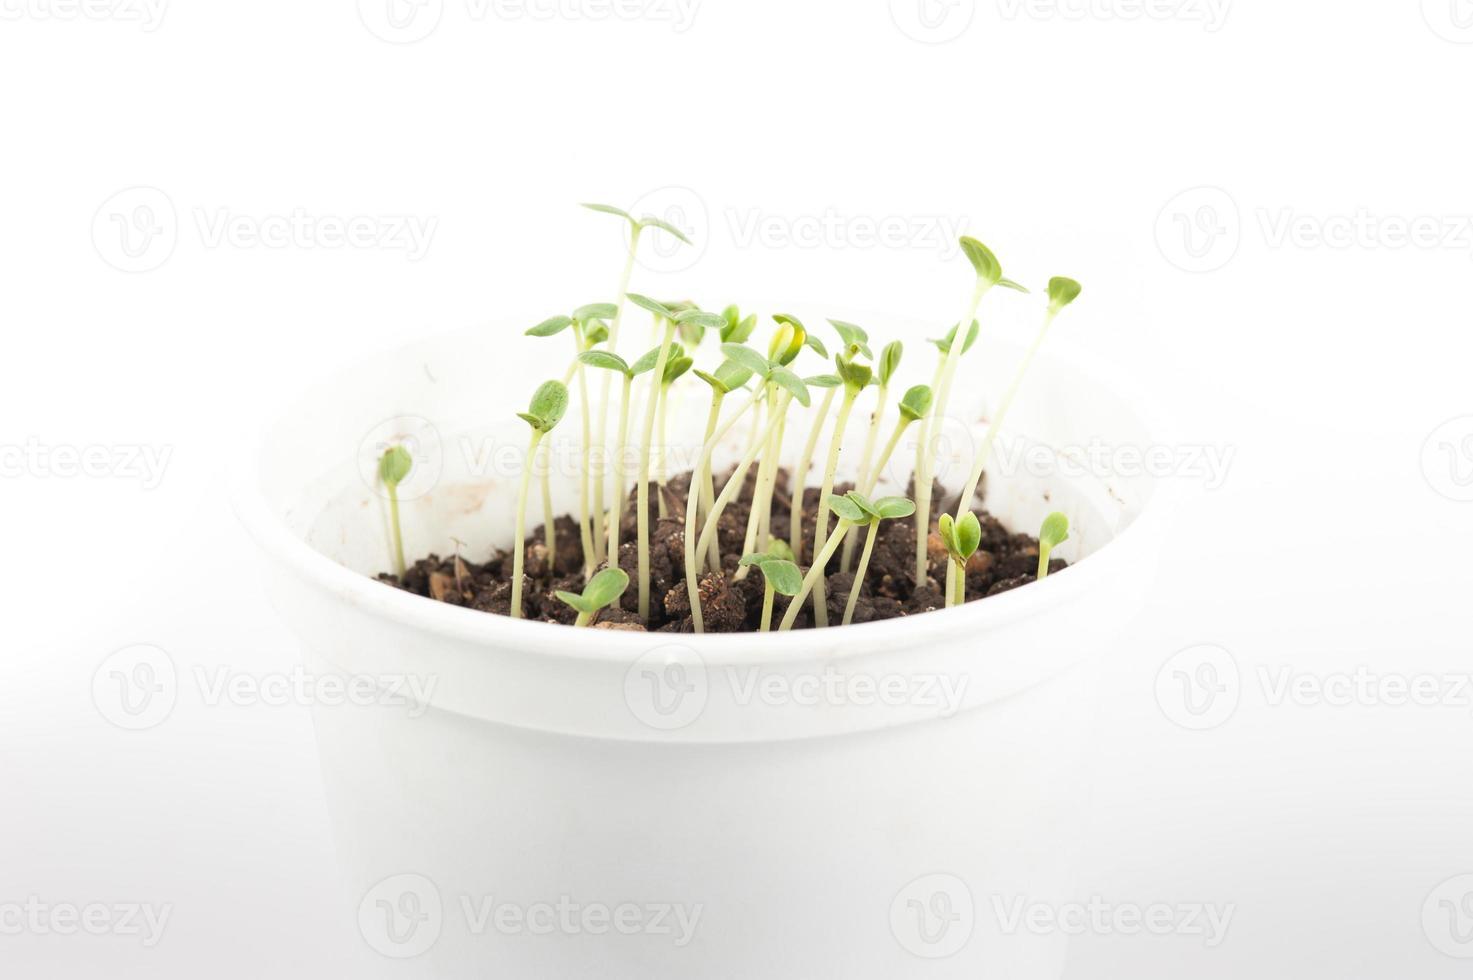 Nahaufnahme des Wachstums des grünen Sämlings foto